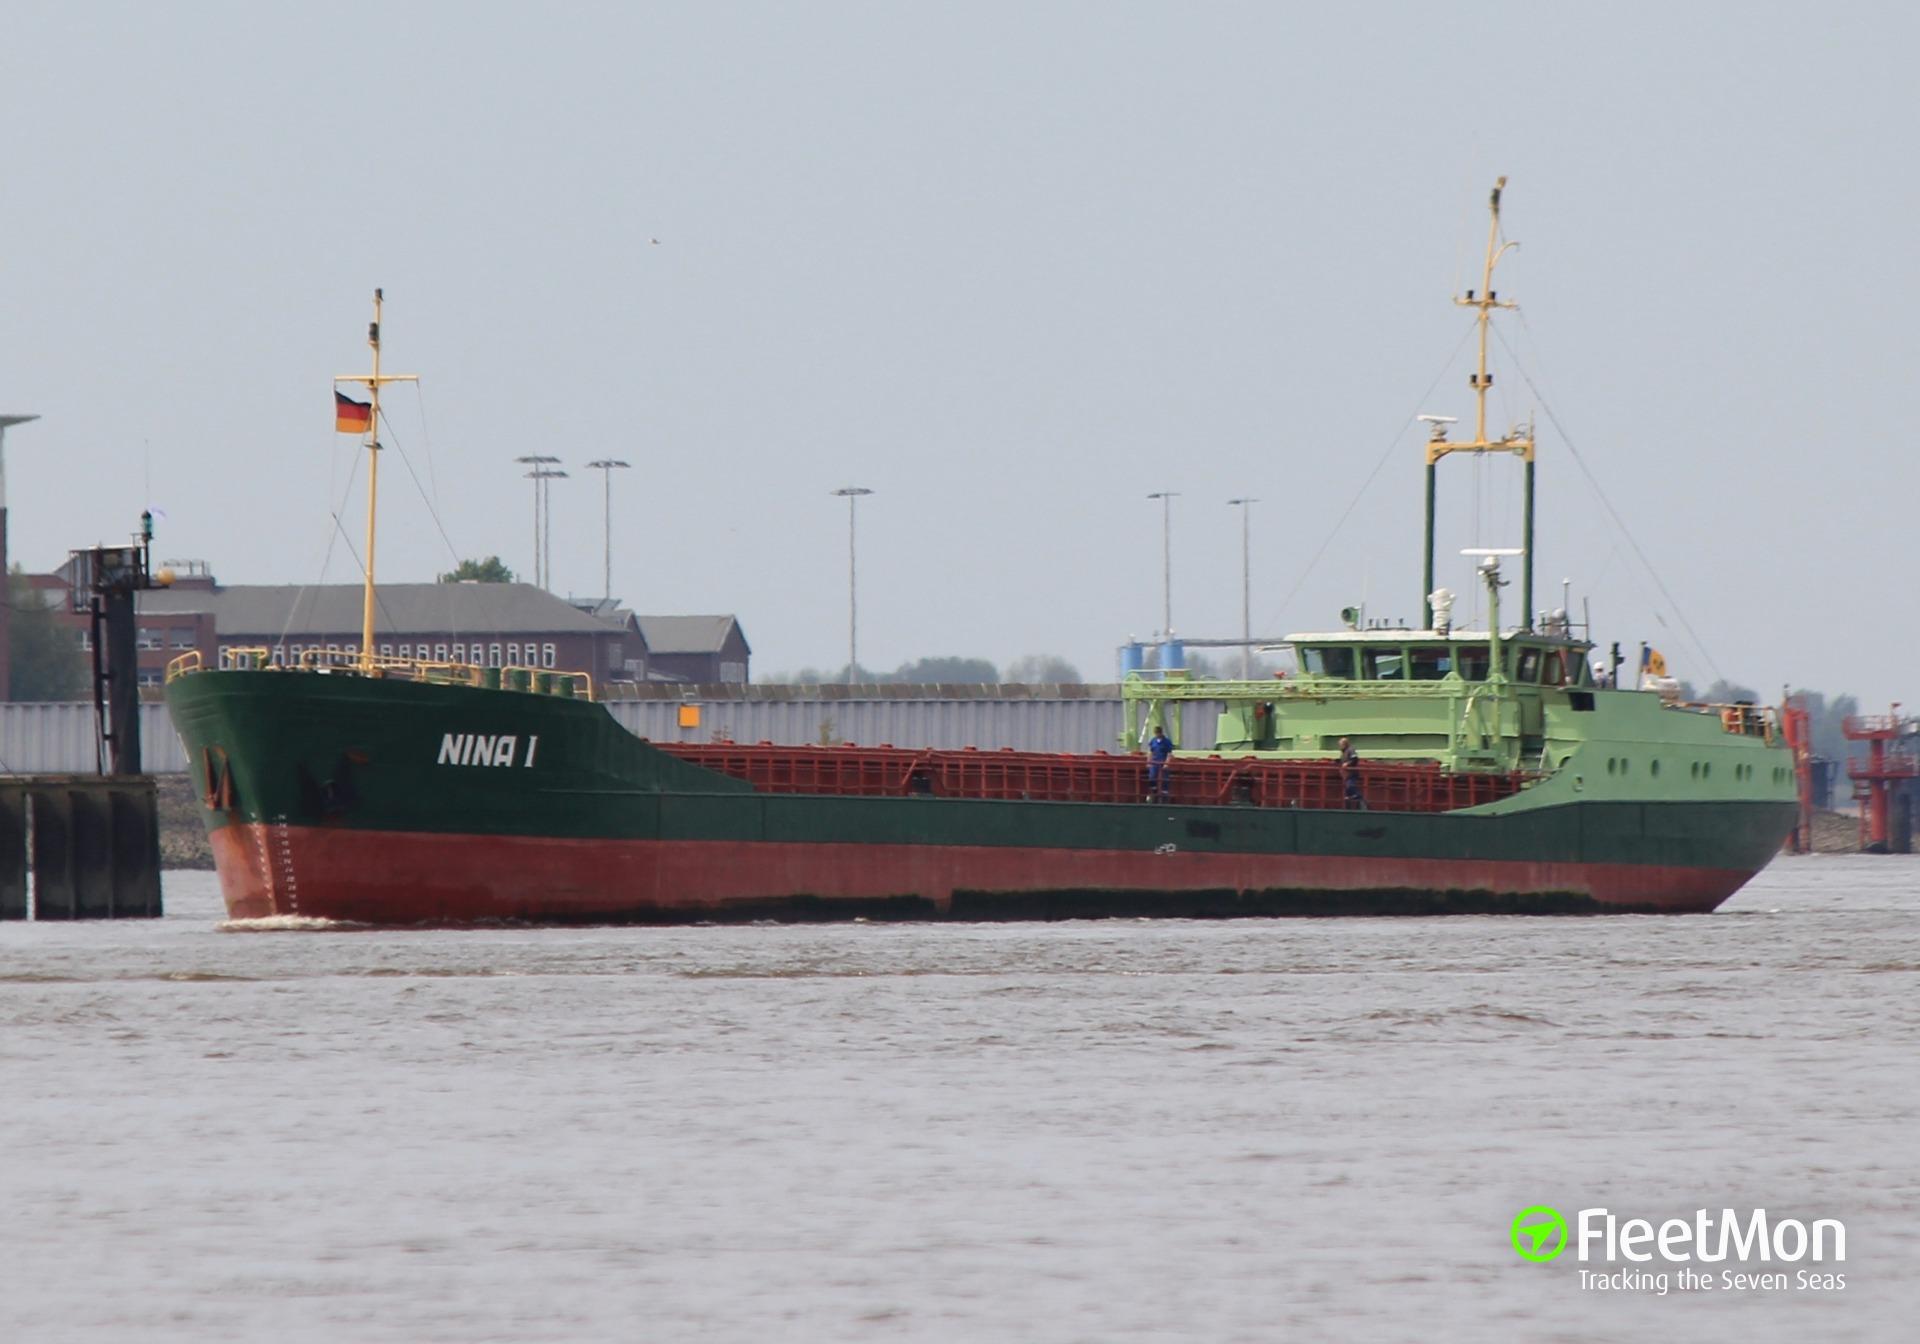 Cargo ship ran aground in North sea